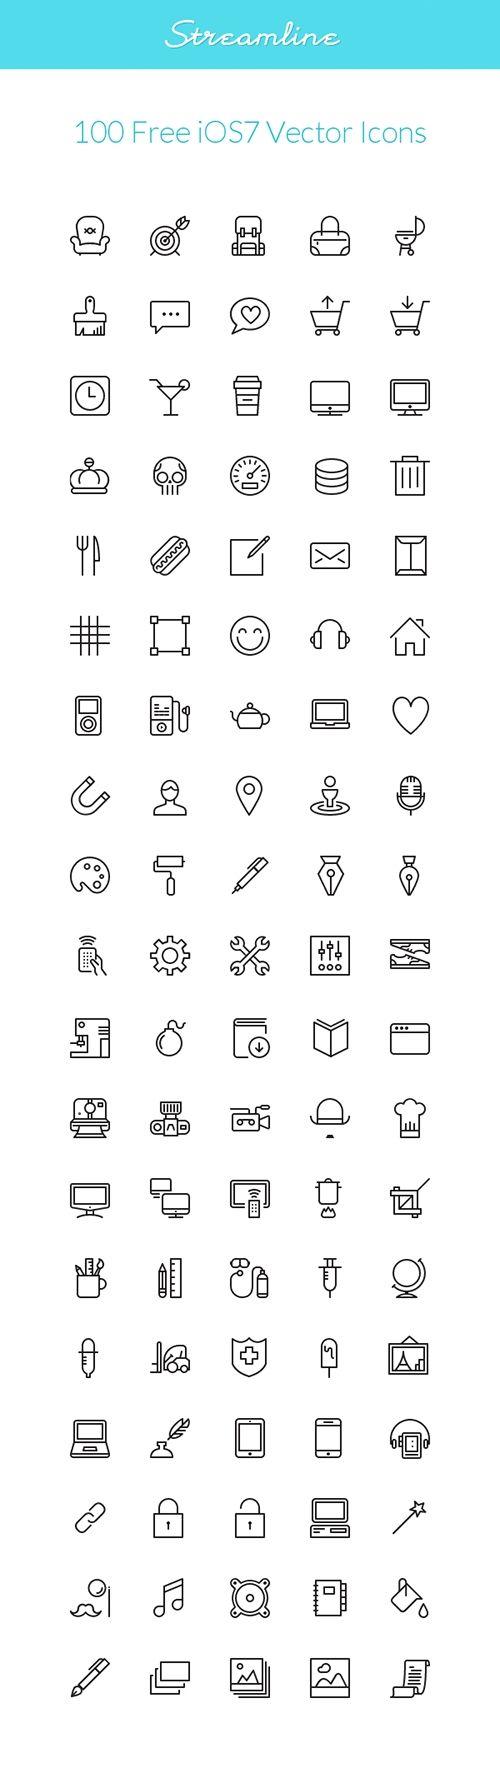 Wireless icon line iconset iconsmind - Vector Web Icons Streamline Ios7